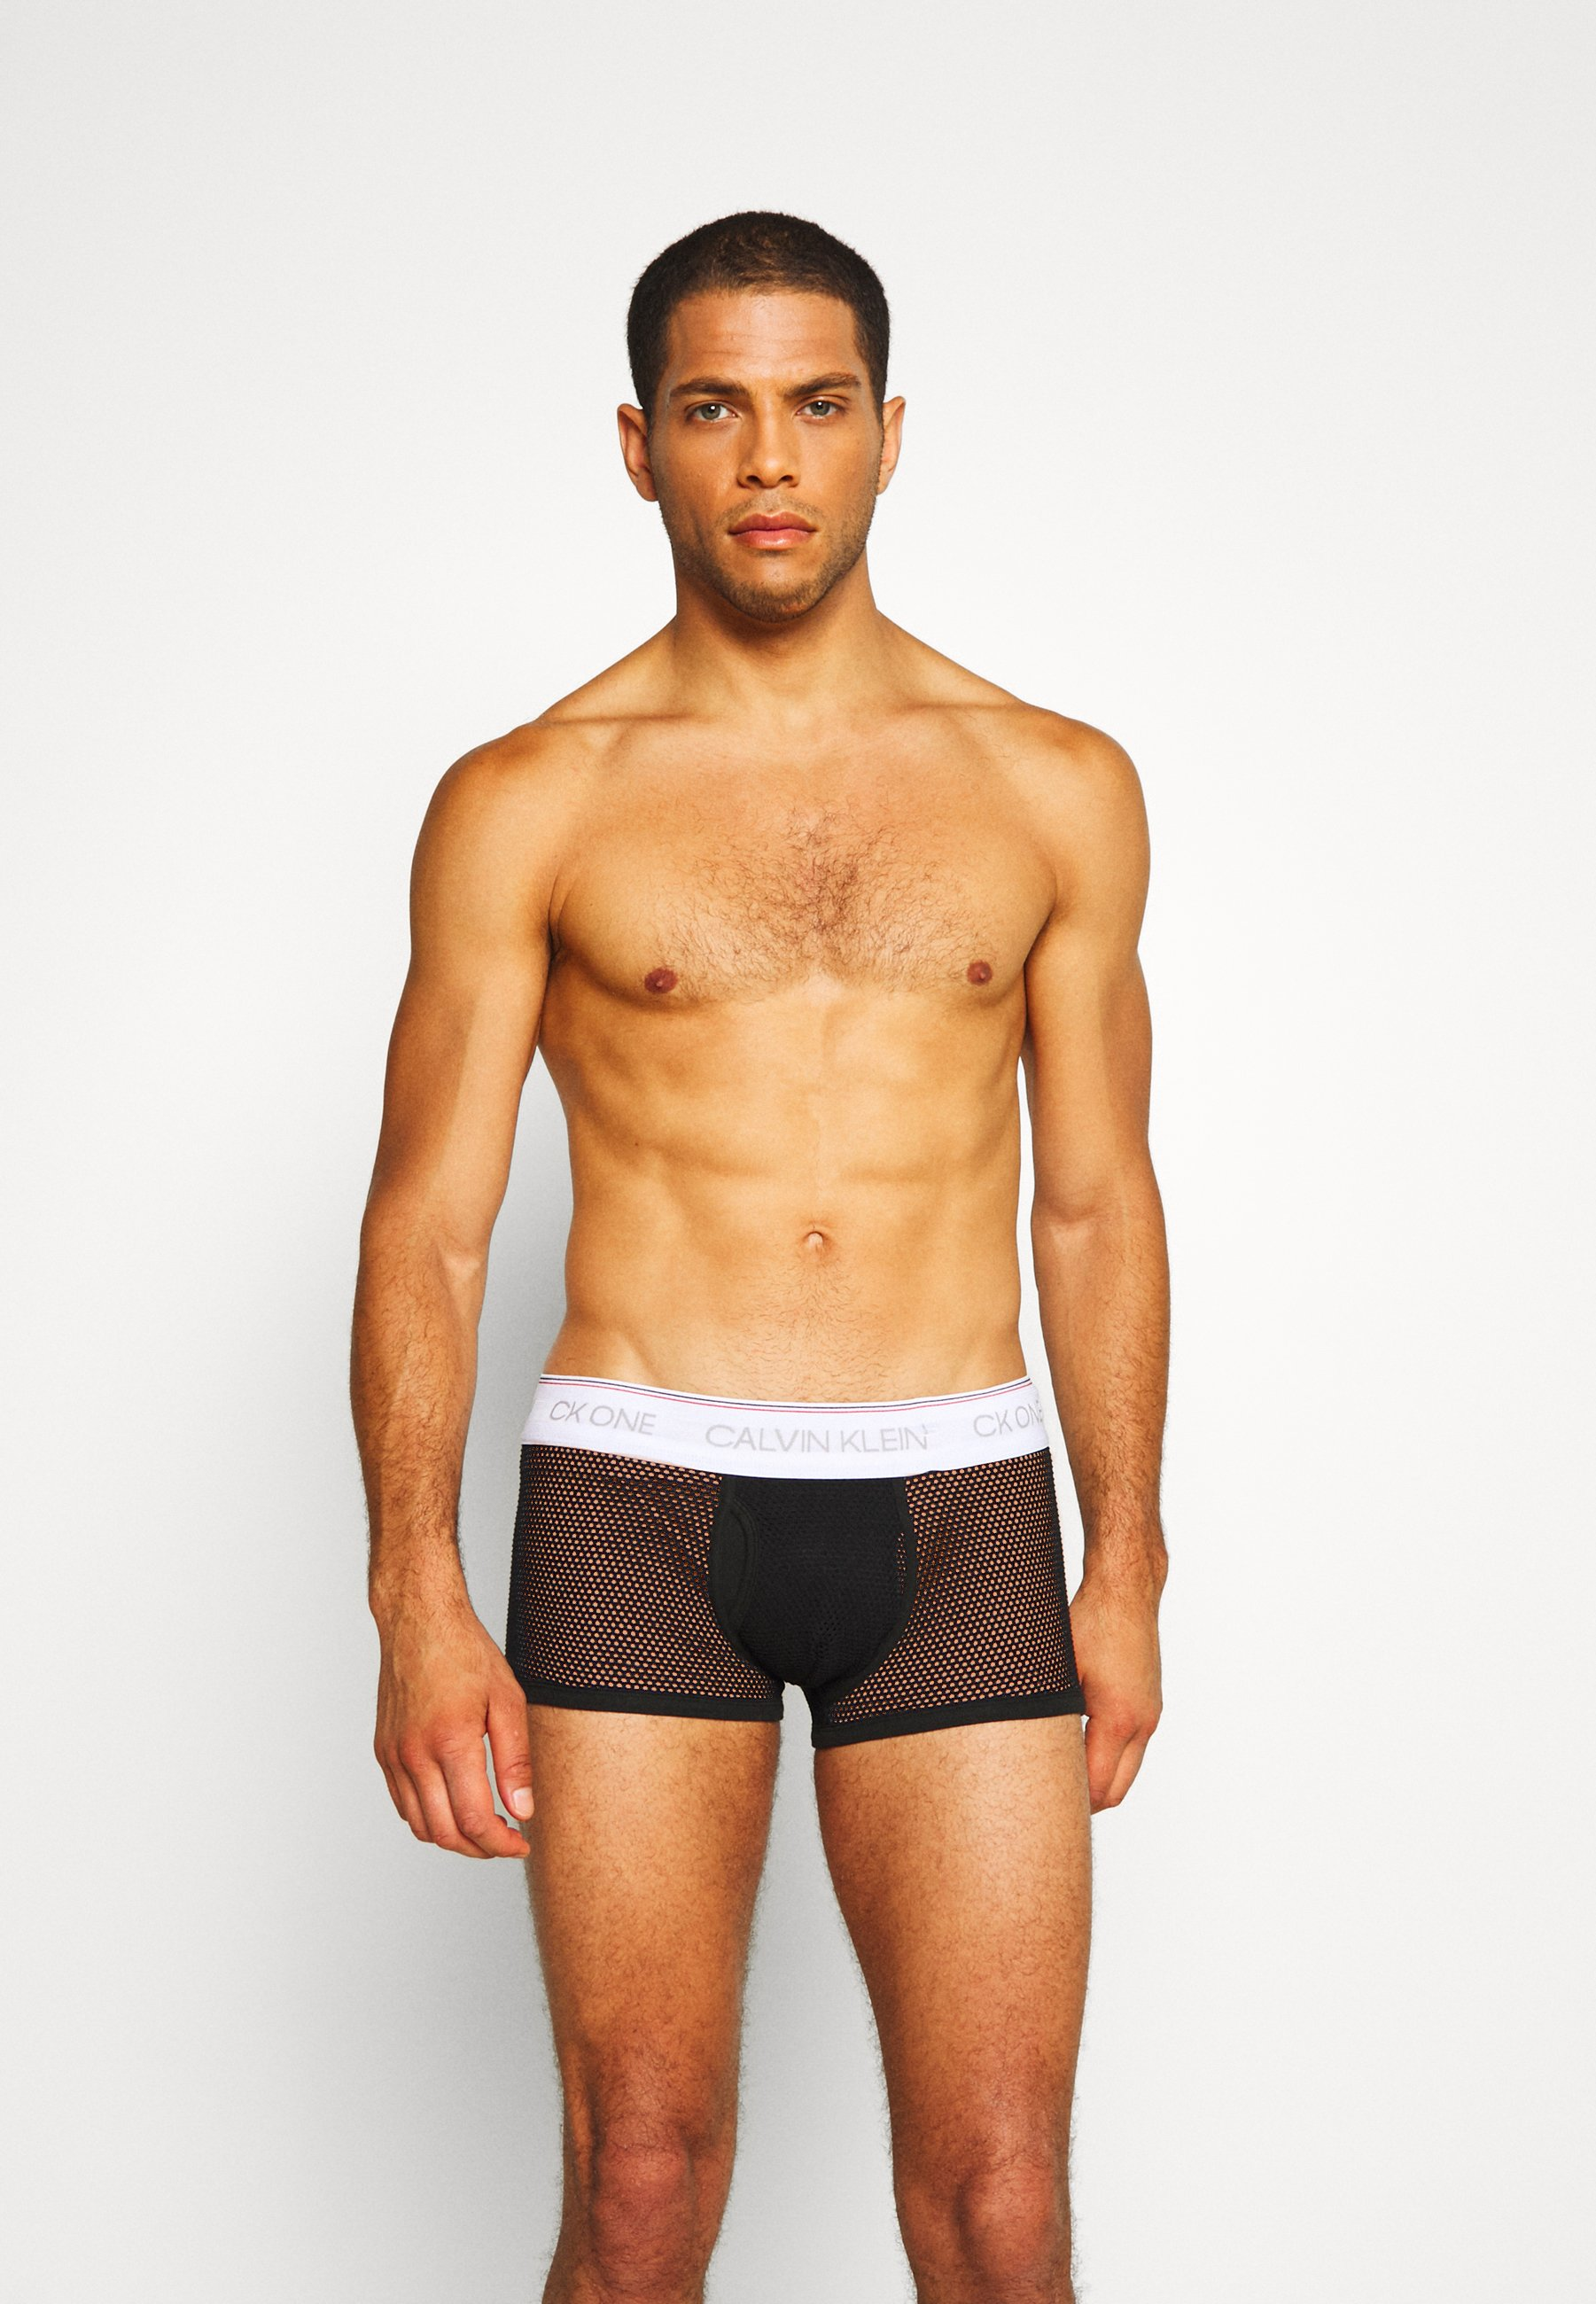 Calvin Klein Underwear TRUNK - Panty - black - Odzież męska 2020